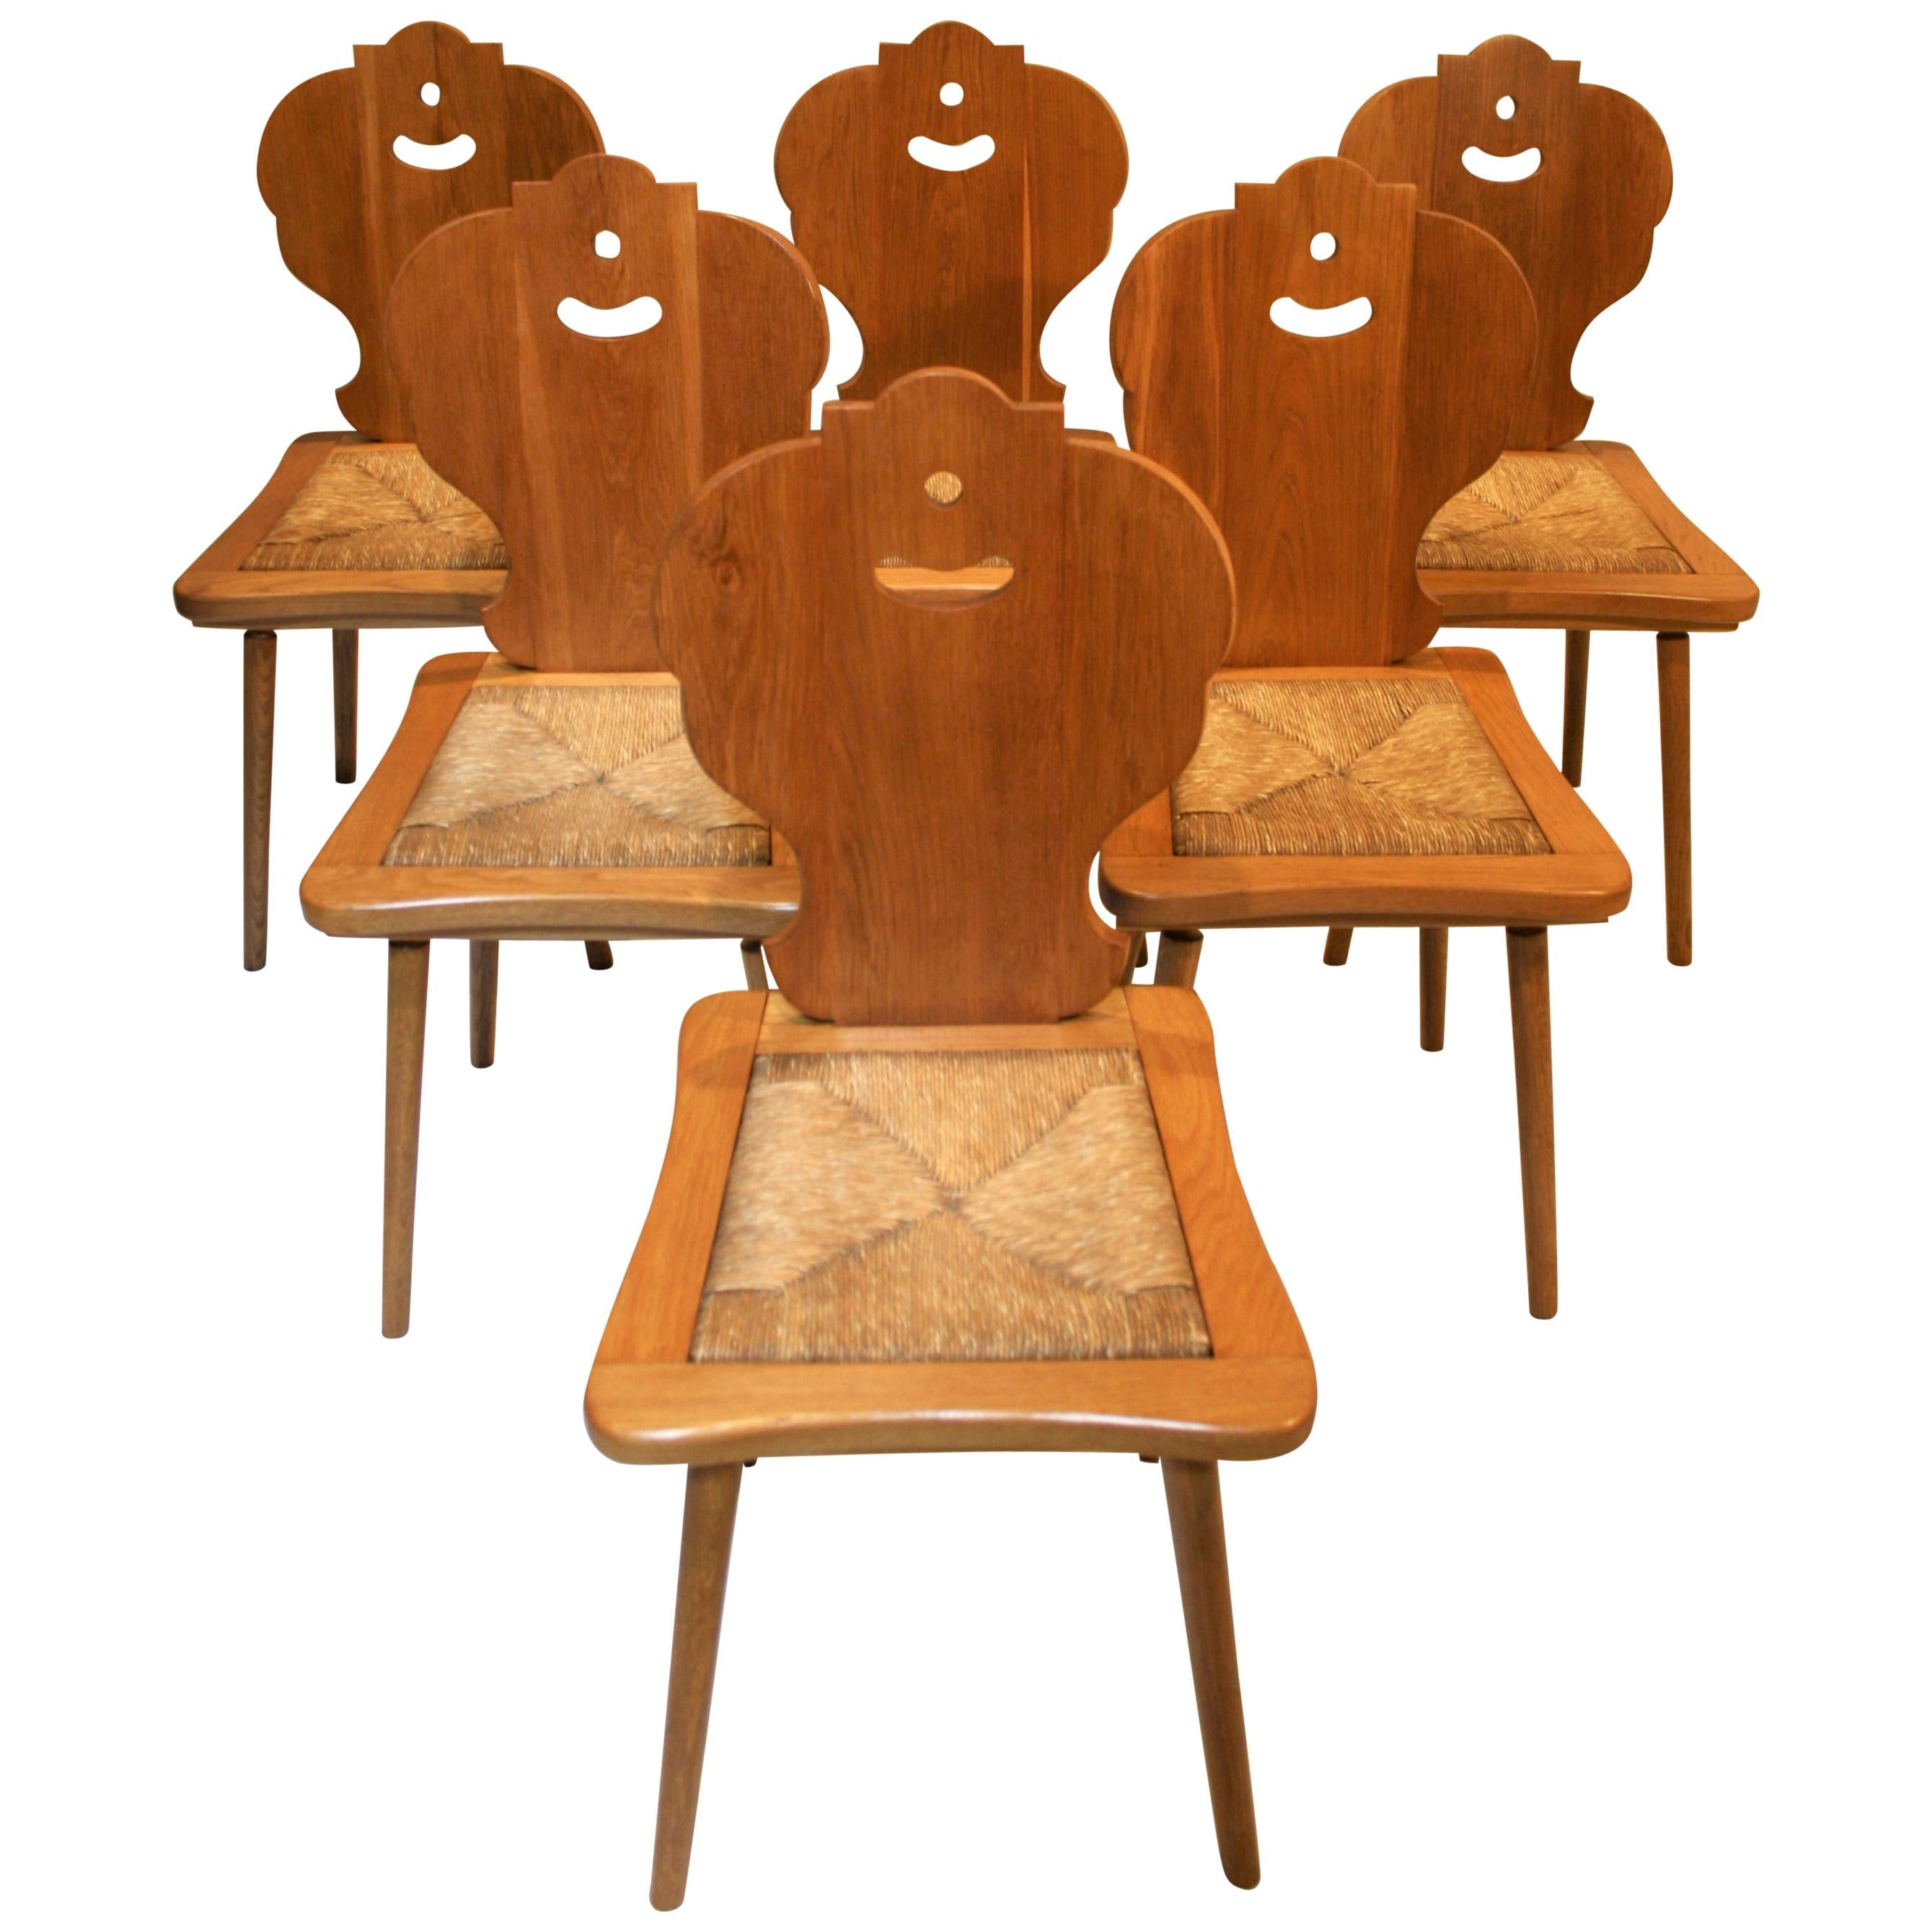 Six Scandinavian Midcentury Dining Chairs